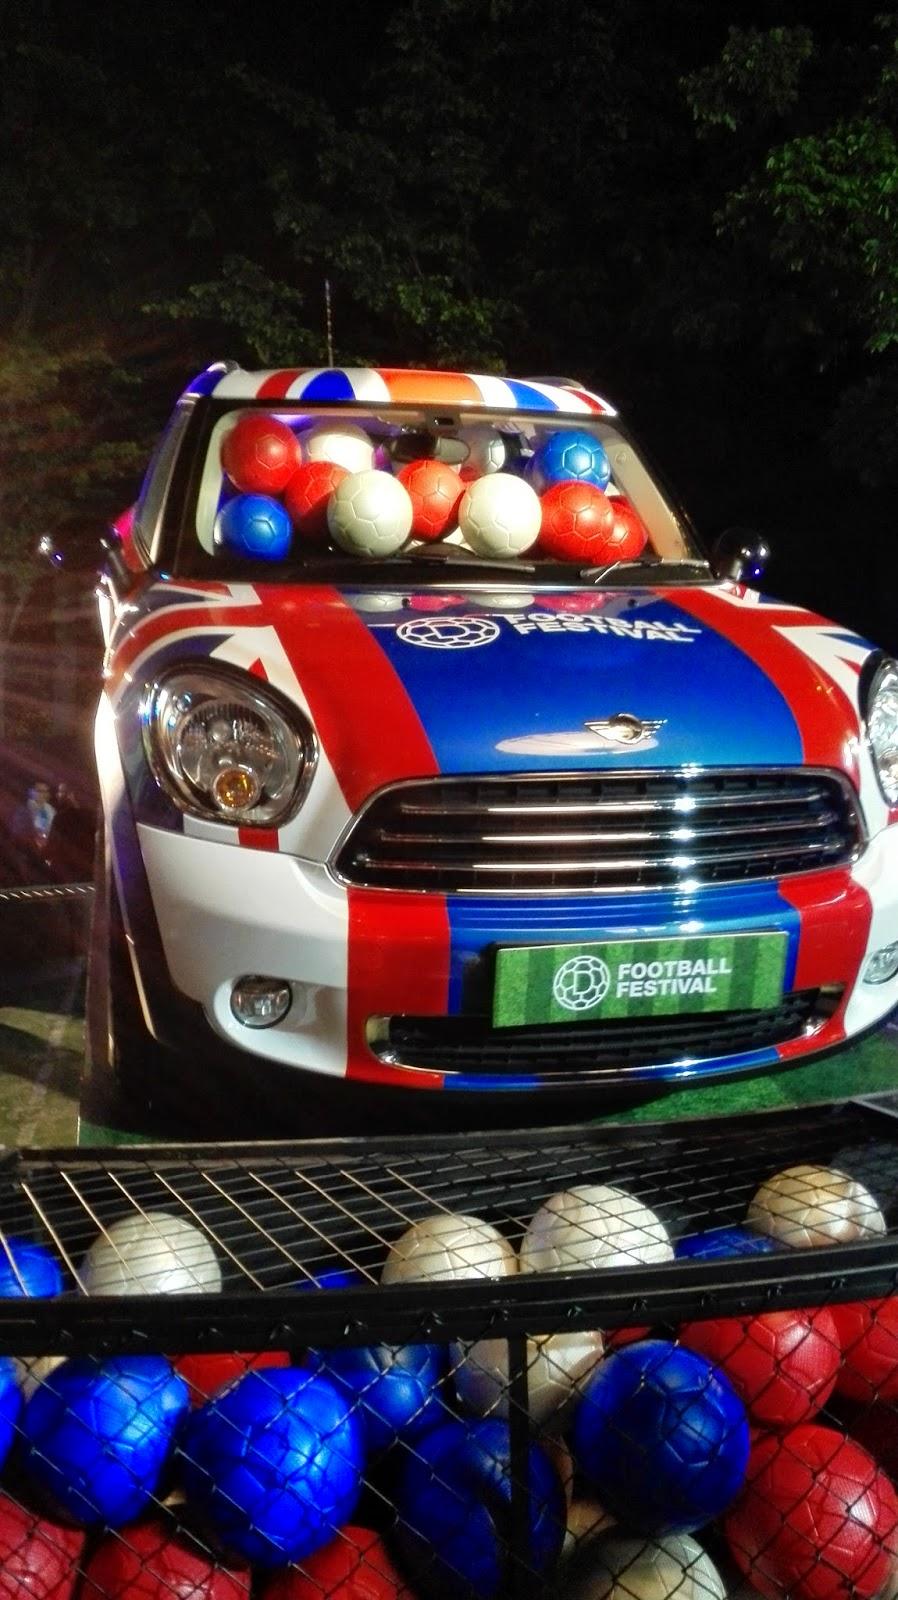 DFootball_Festival_Mini_cooper